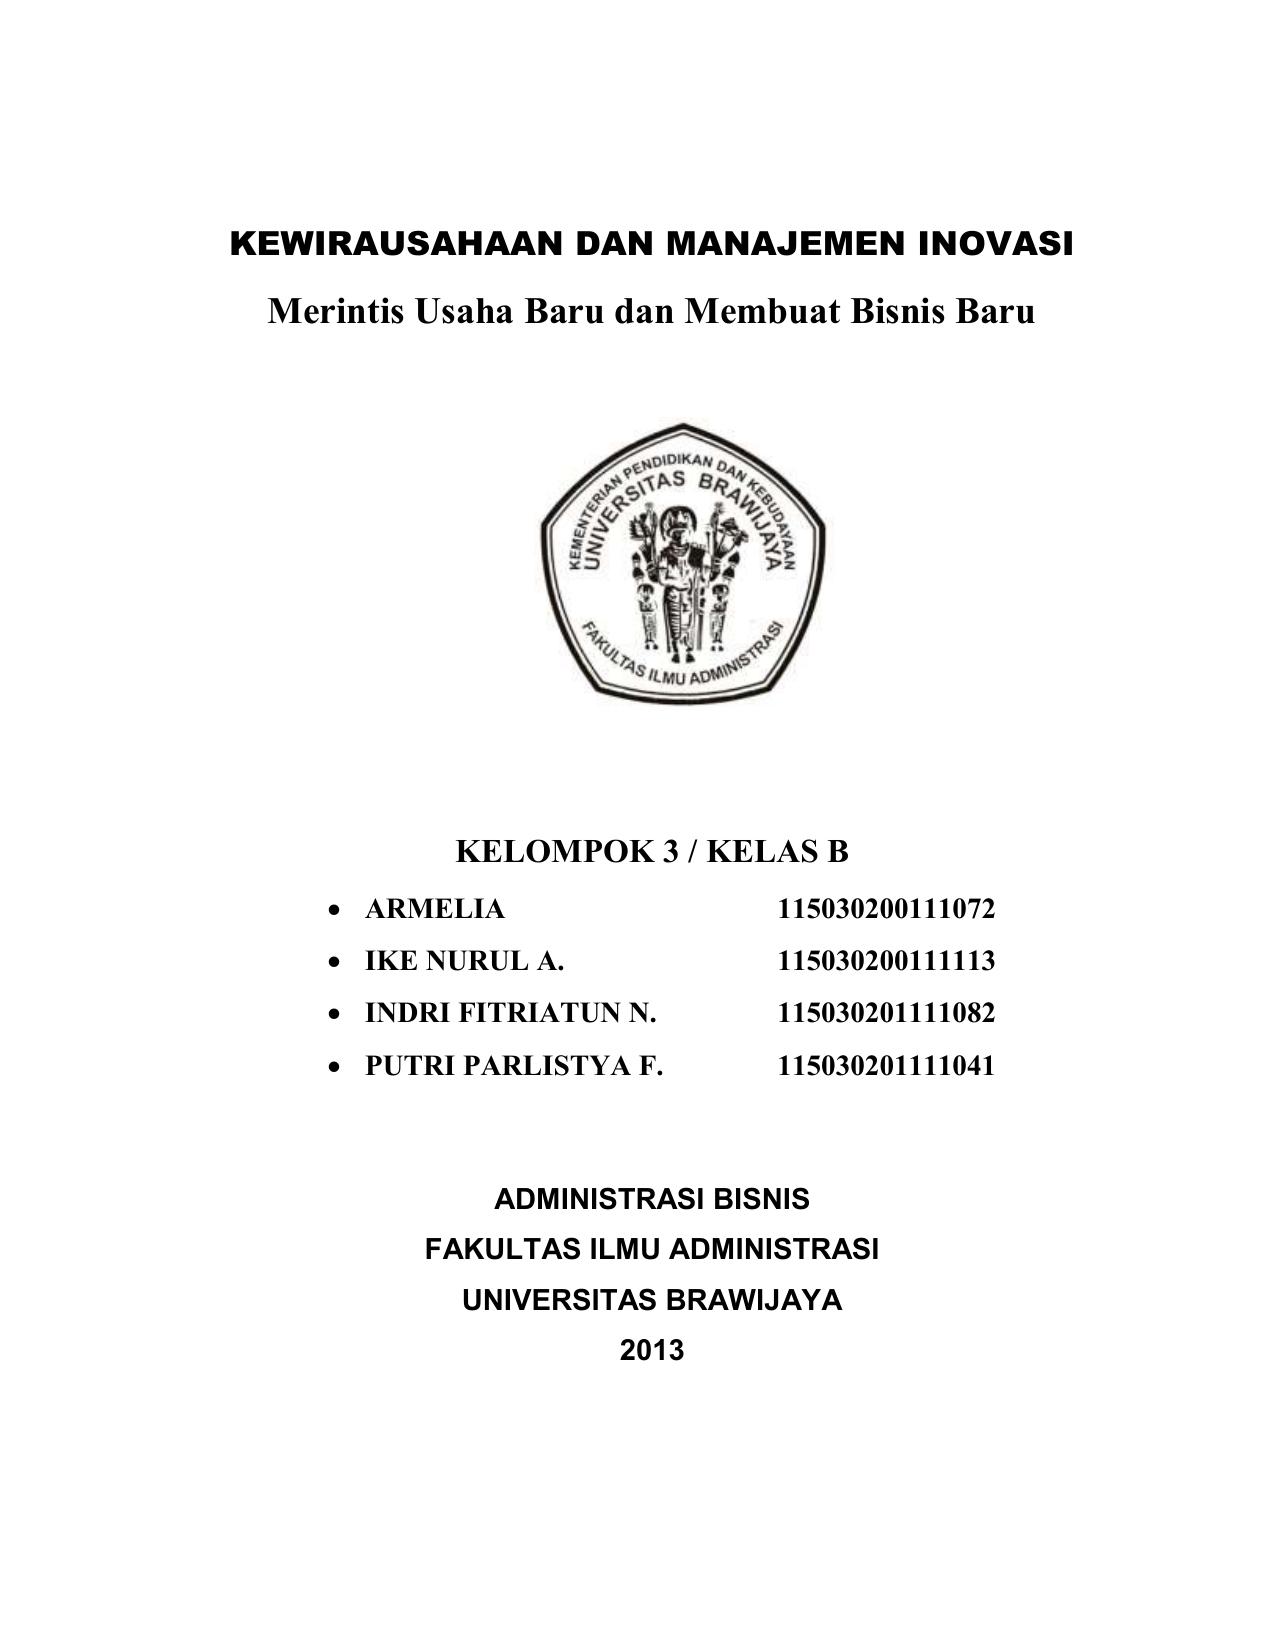 Makalah Universitas Brawijaya